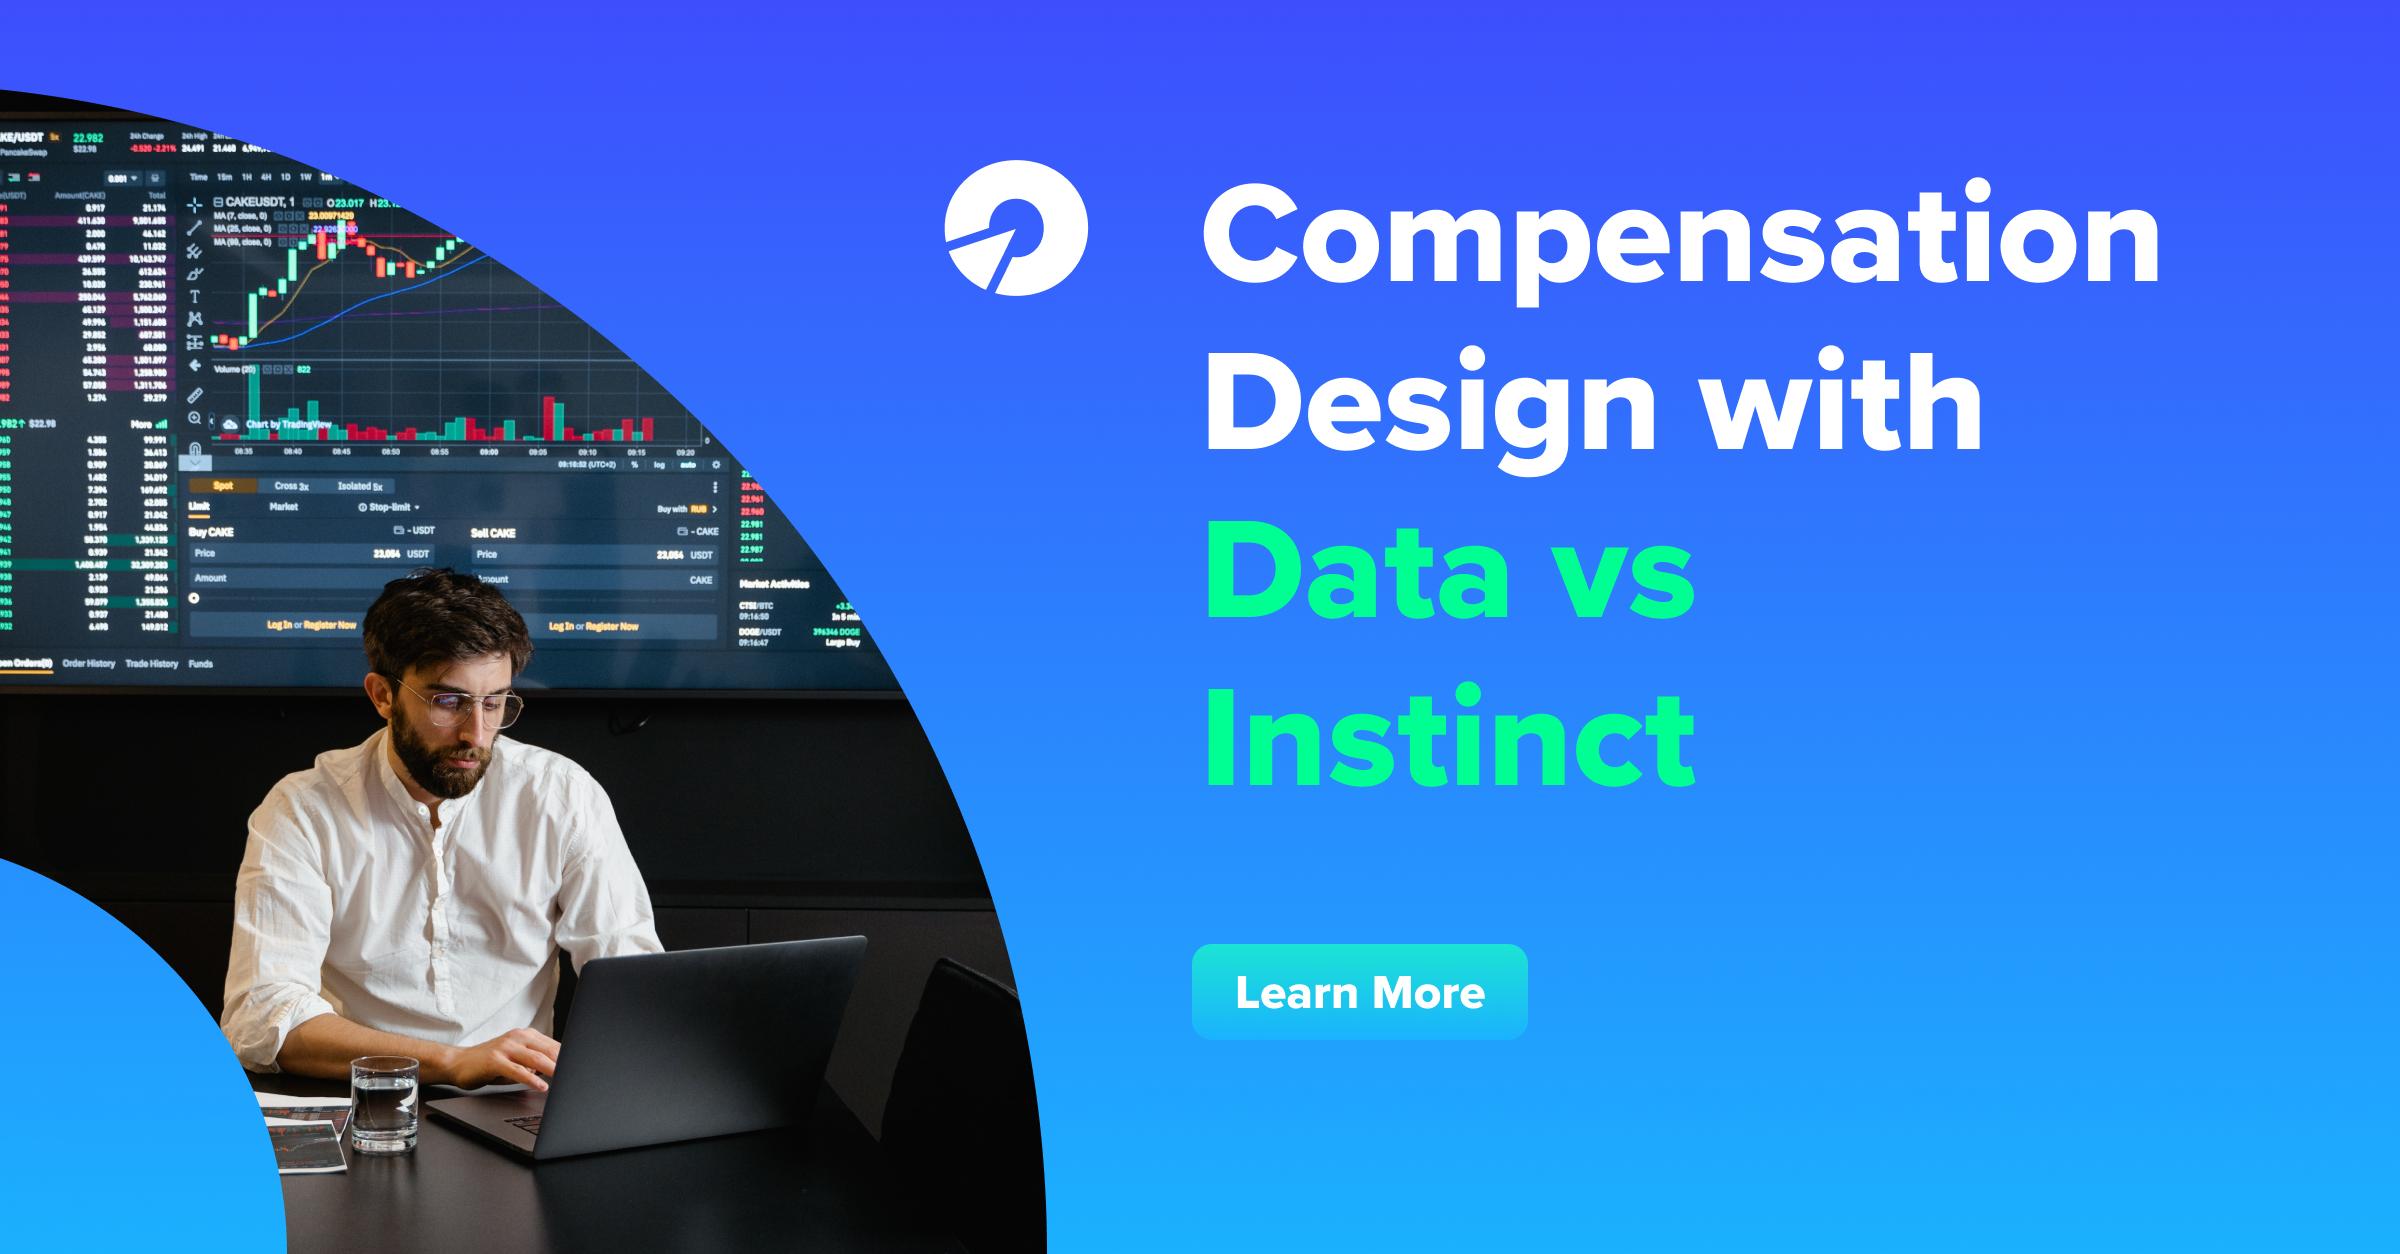 Compensation Design with Data vs Instinct